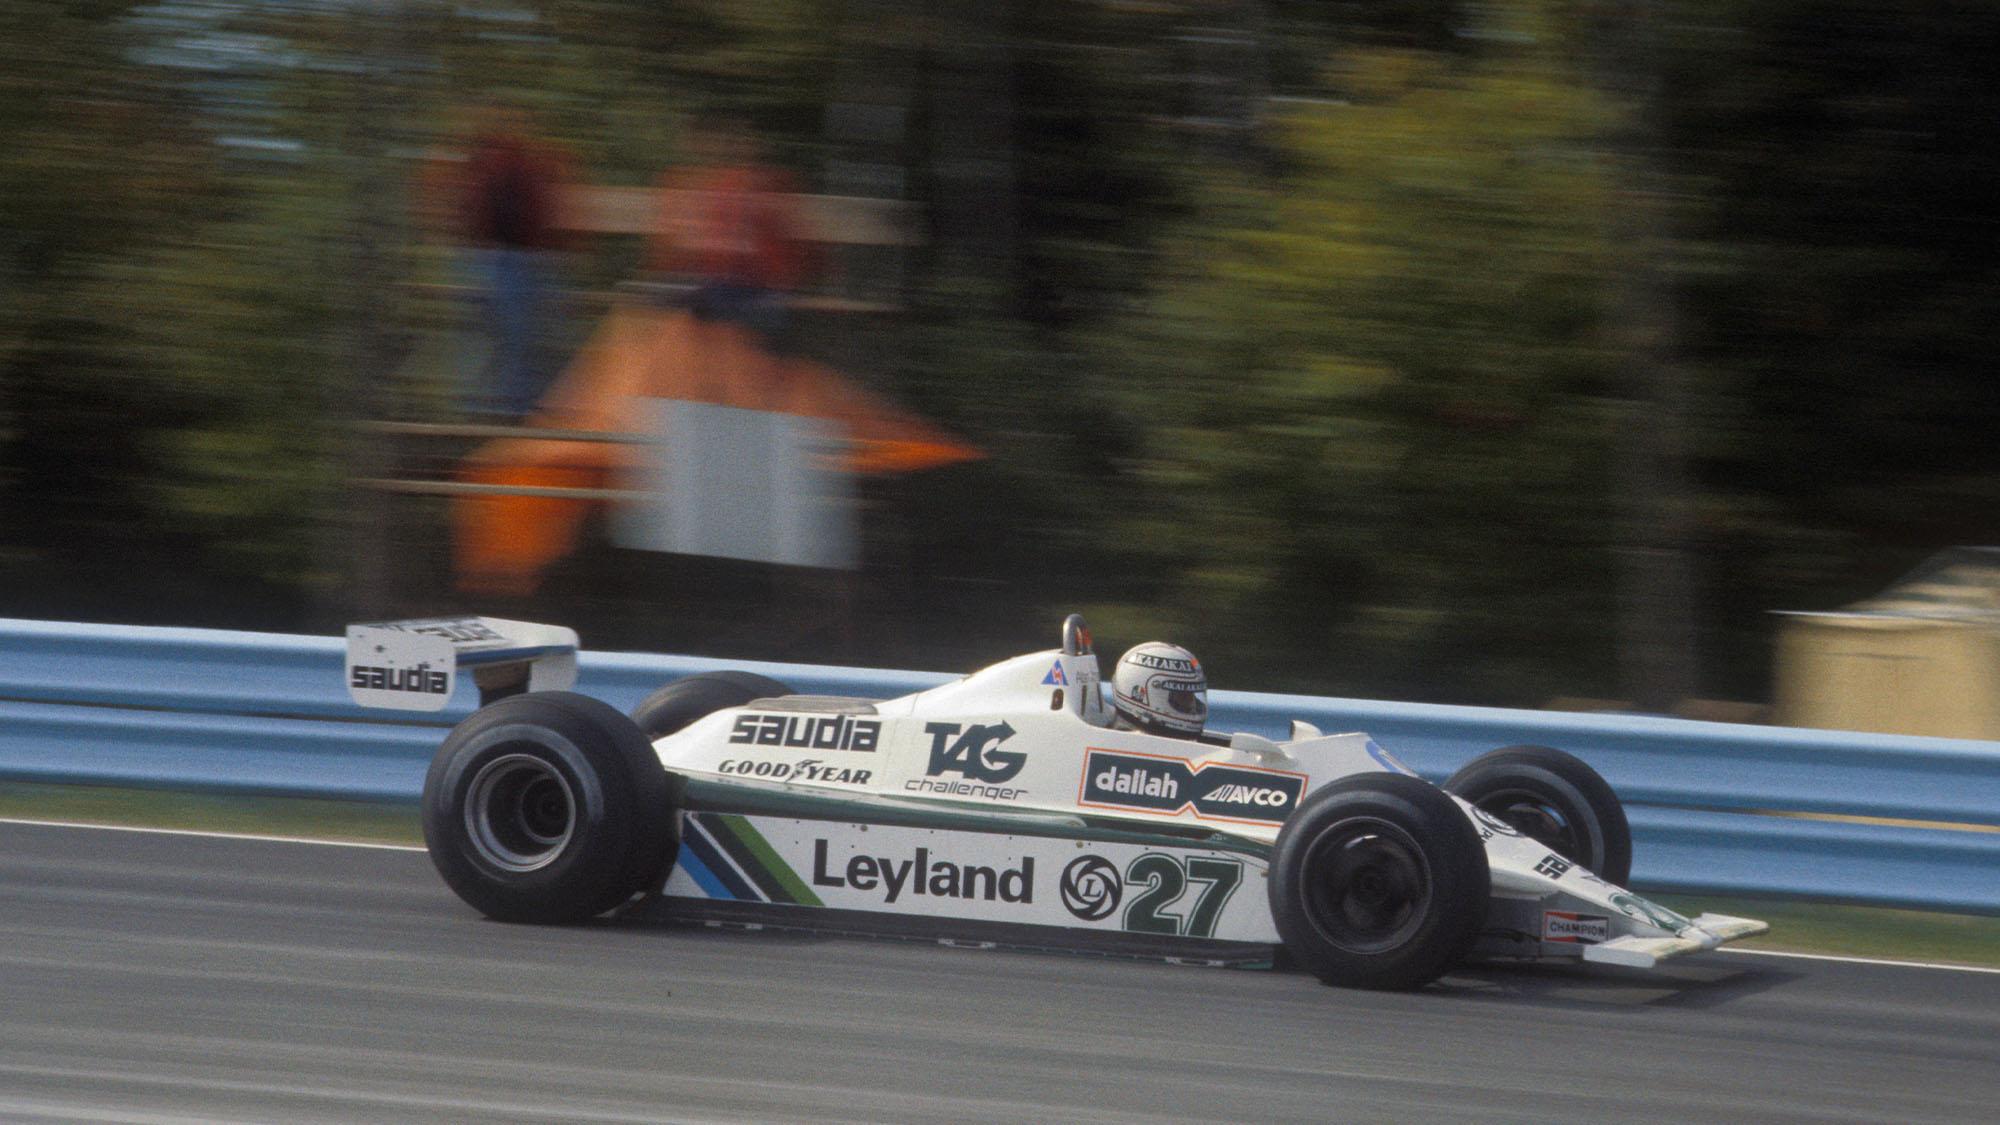 Alan Jones (Williams-Ford) in the 1980 United States Grand Prix East in Watkins Glen. Photo: Grand Prix Photo